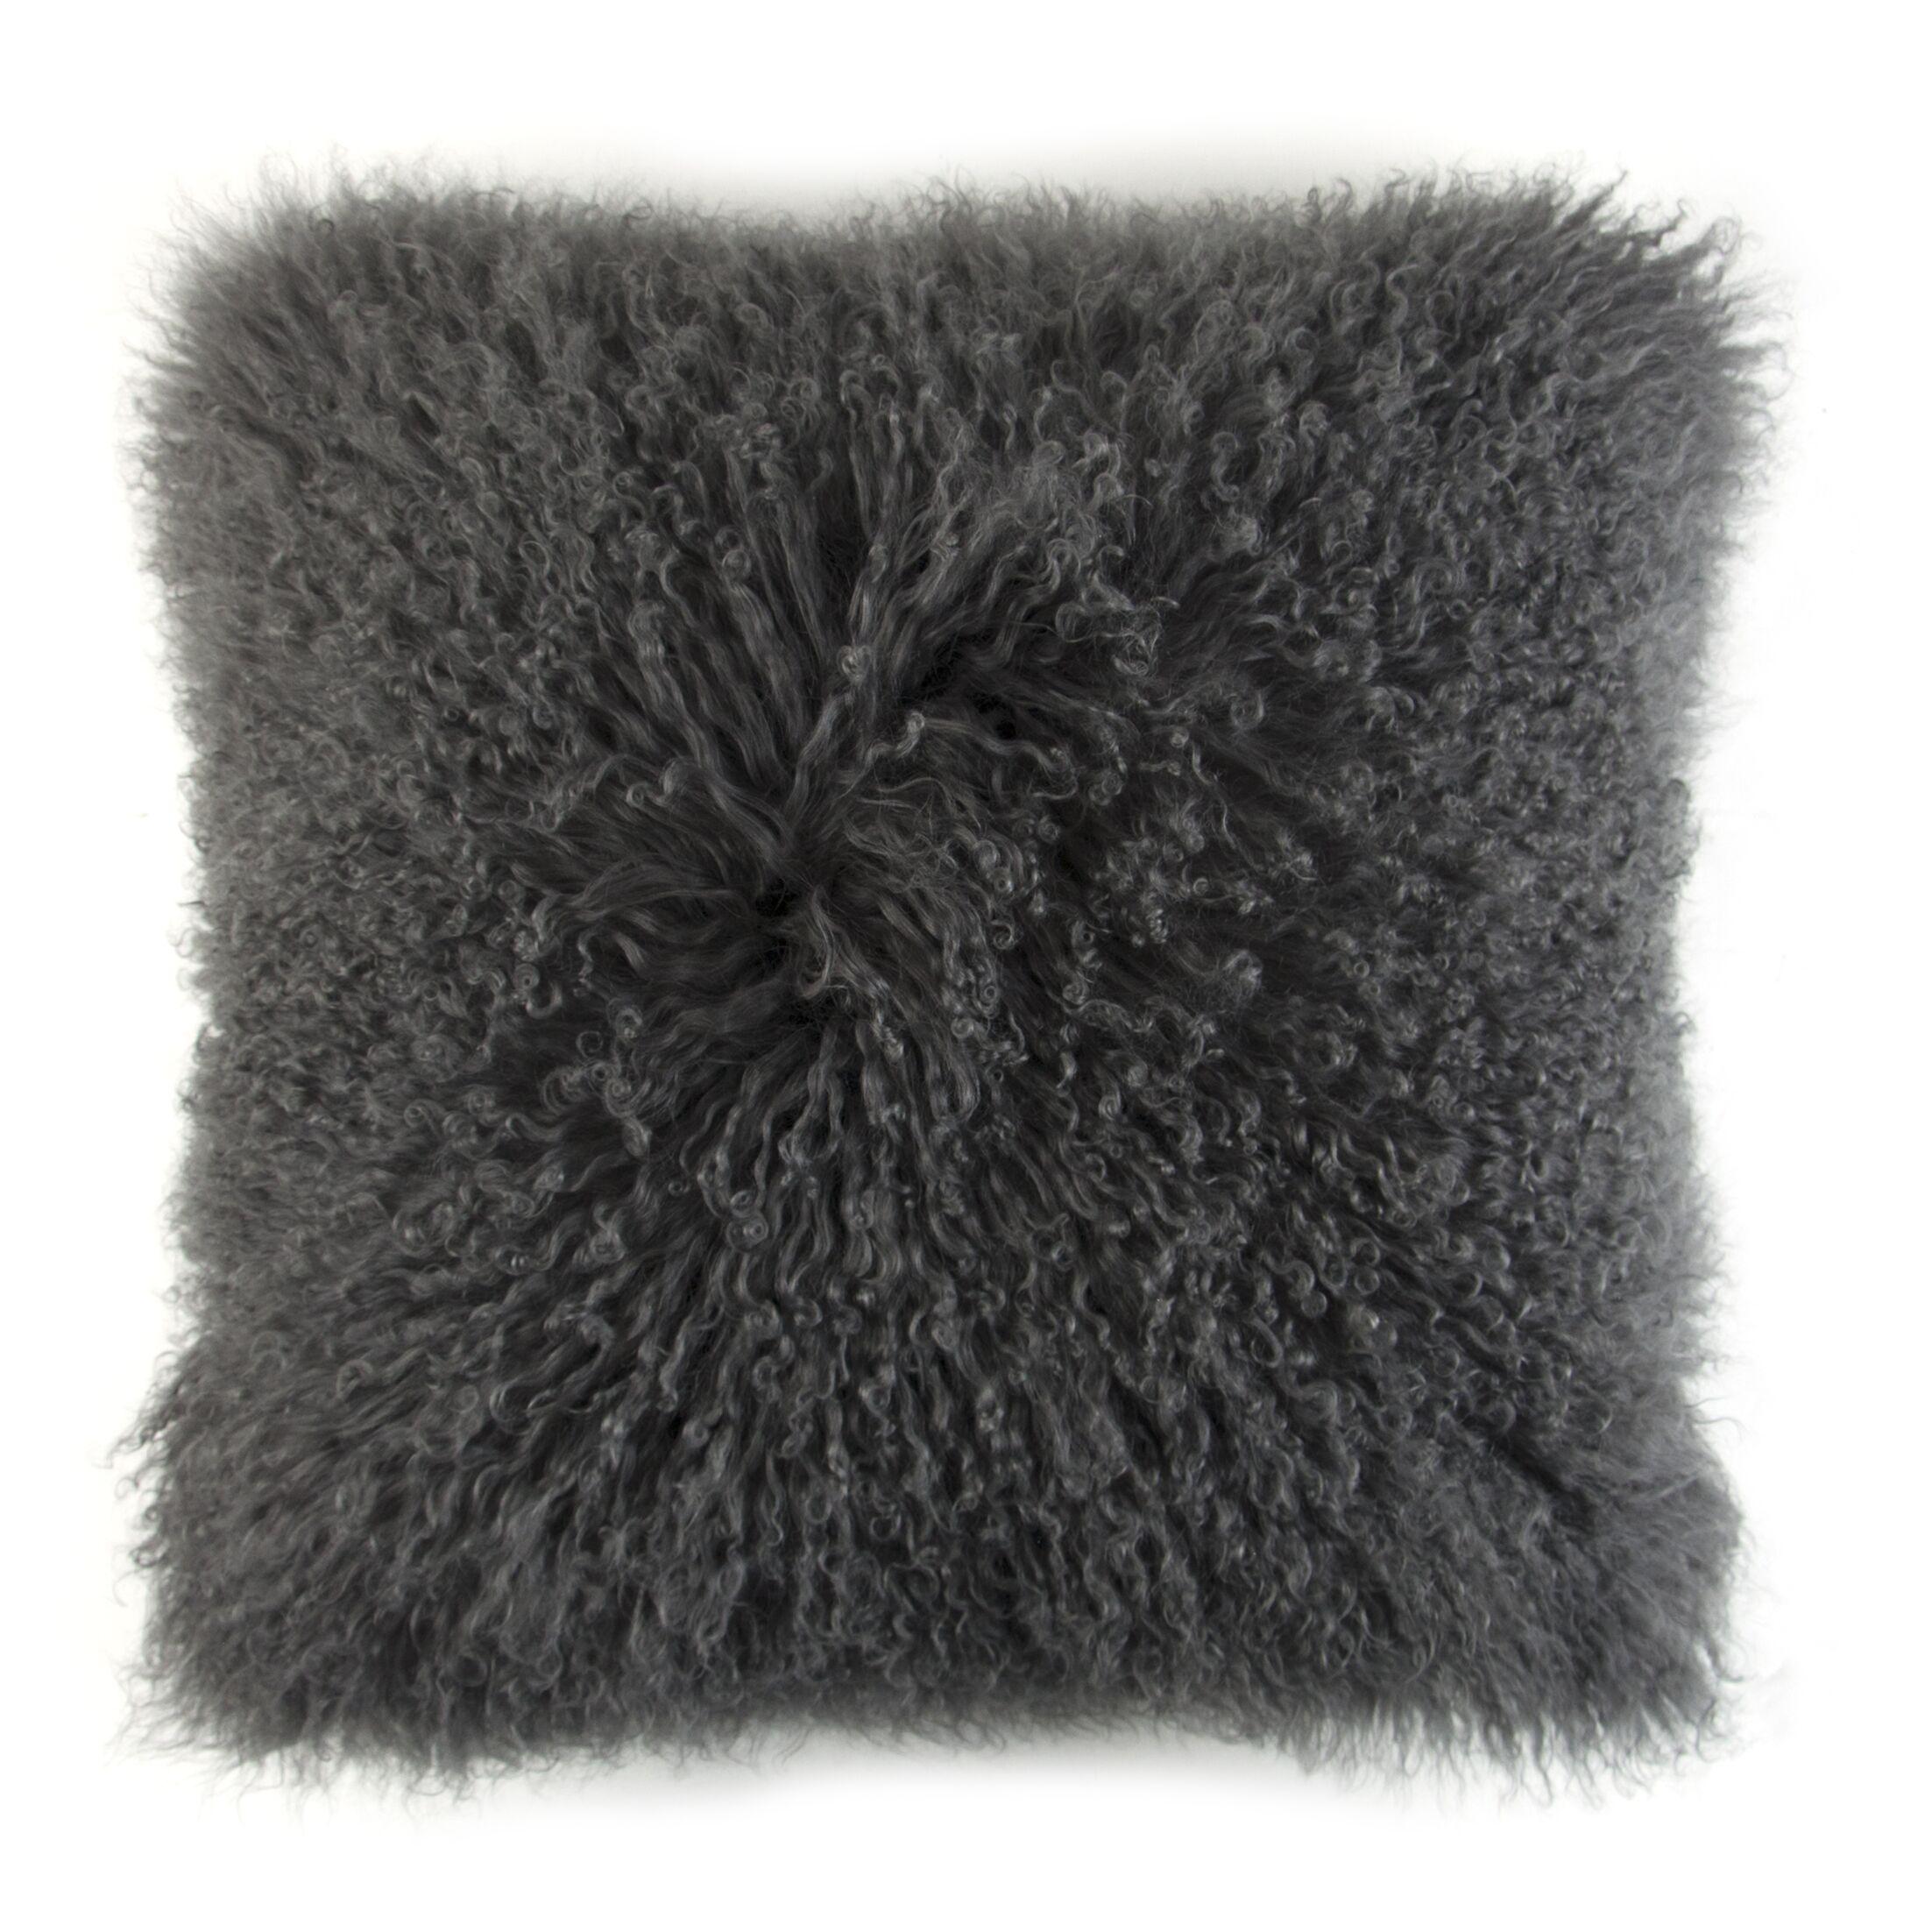 Ewalt Decorative Lamb's Wool Throw Pillow Color: Charcoal